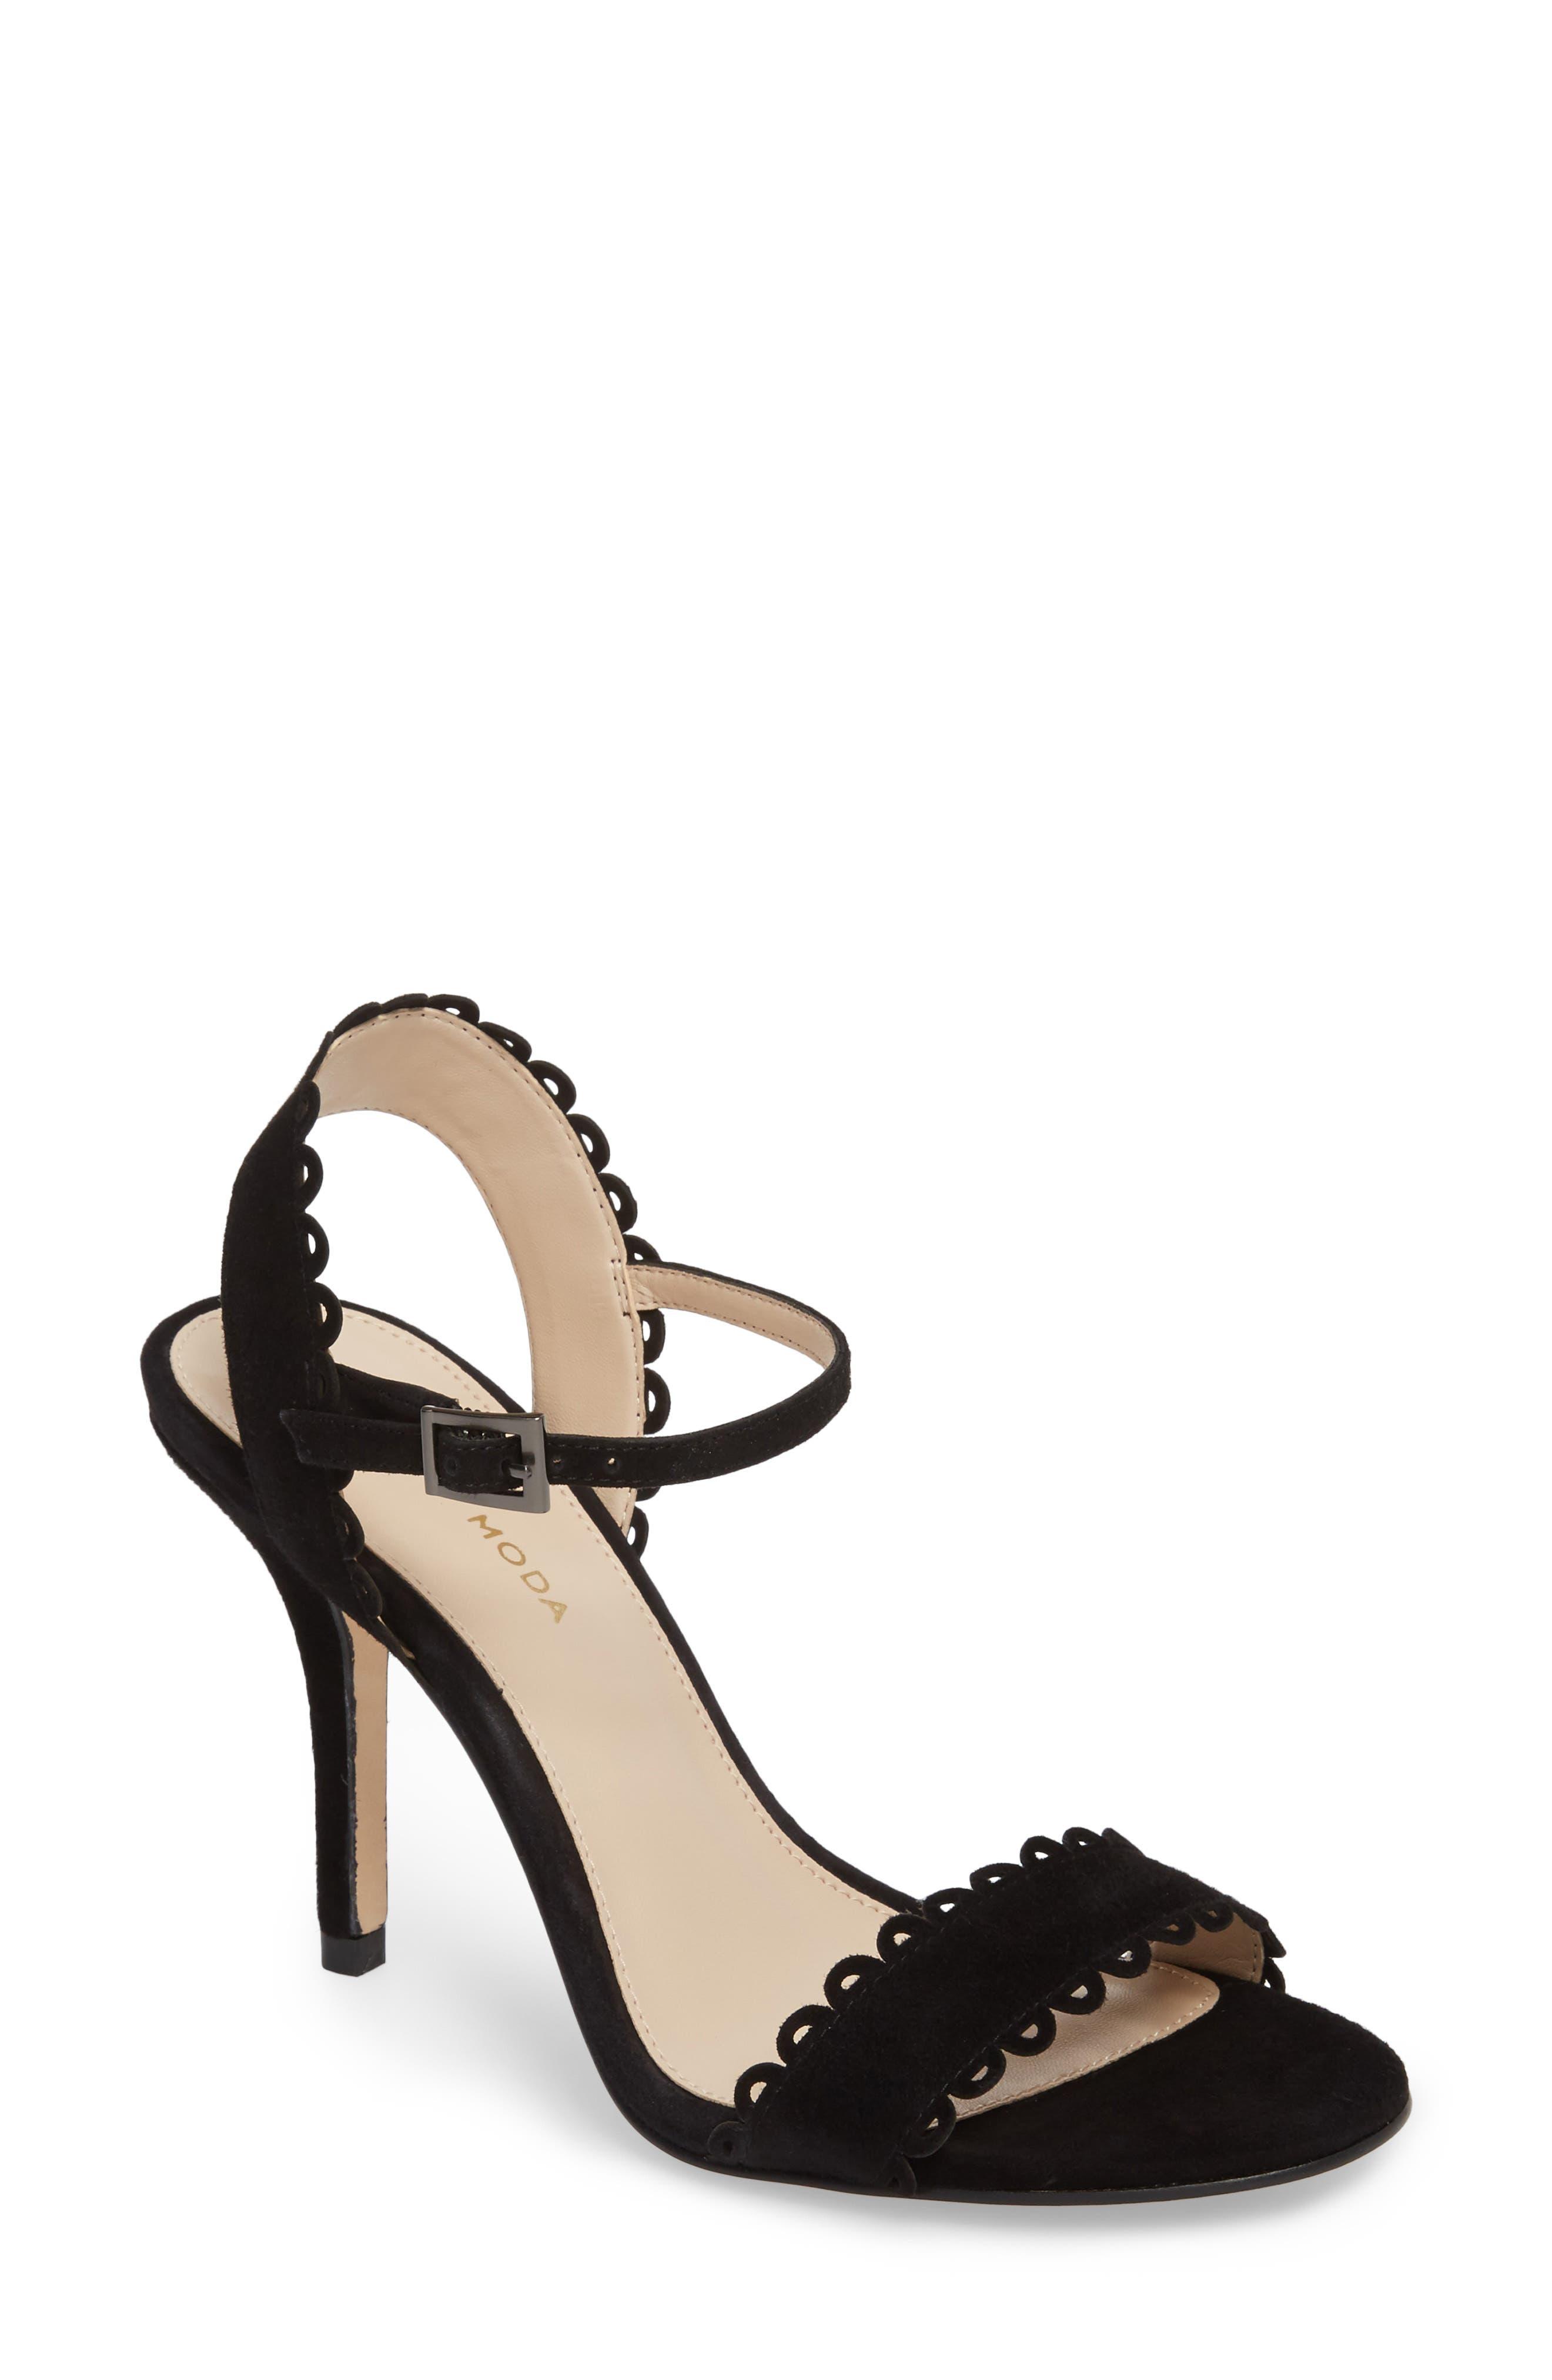 Karen Scallop Ankle Strap Sandal,                             Main thumbnail 1, color,